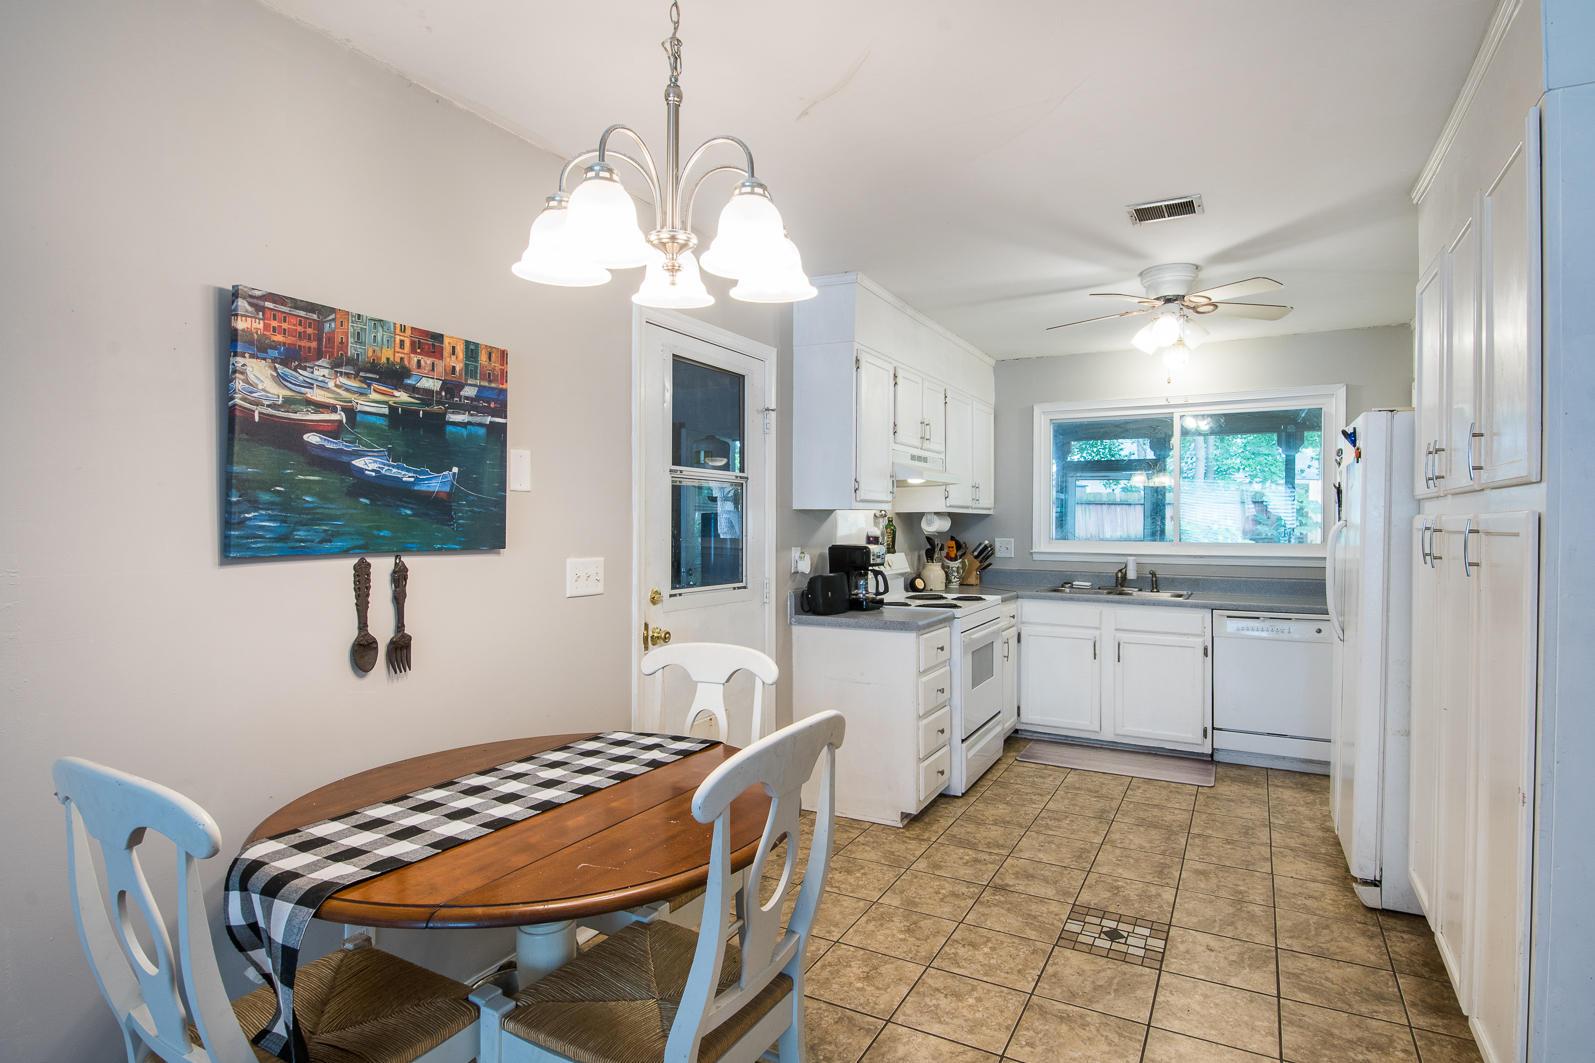 Wando East Homes For Sale - 1605 Babington, Mount Pleasant, SC - 25